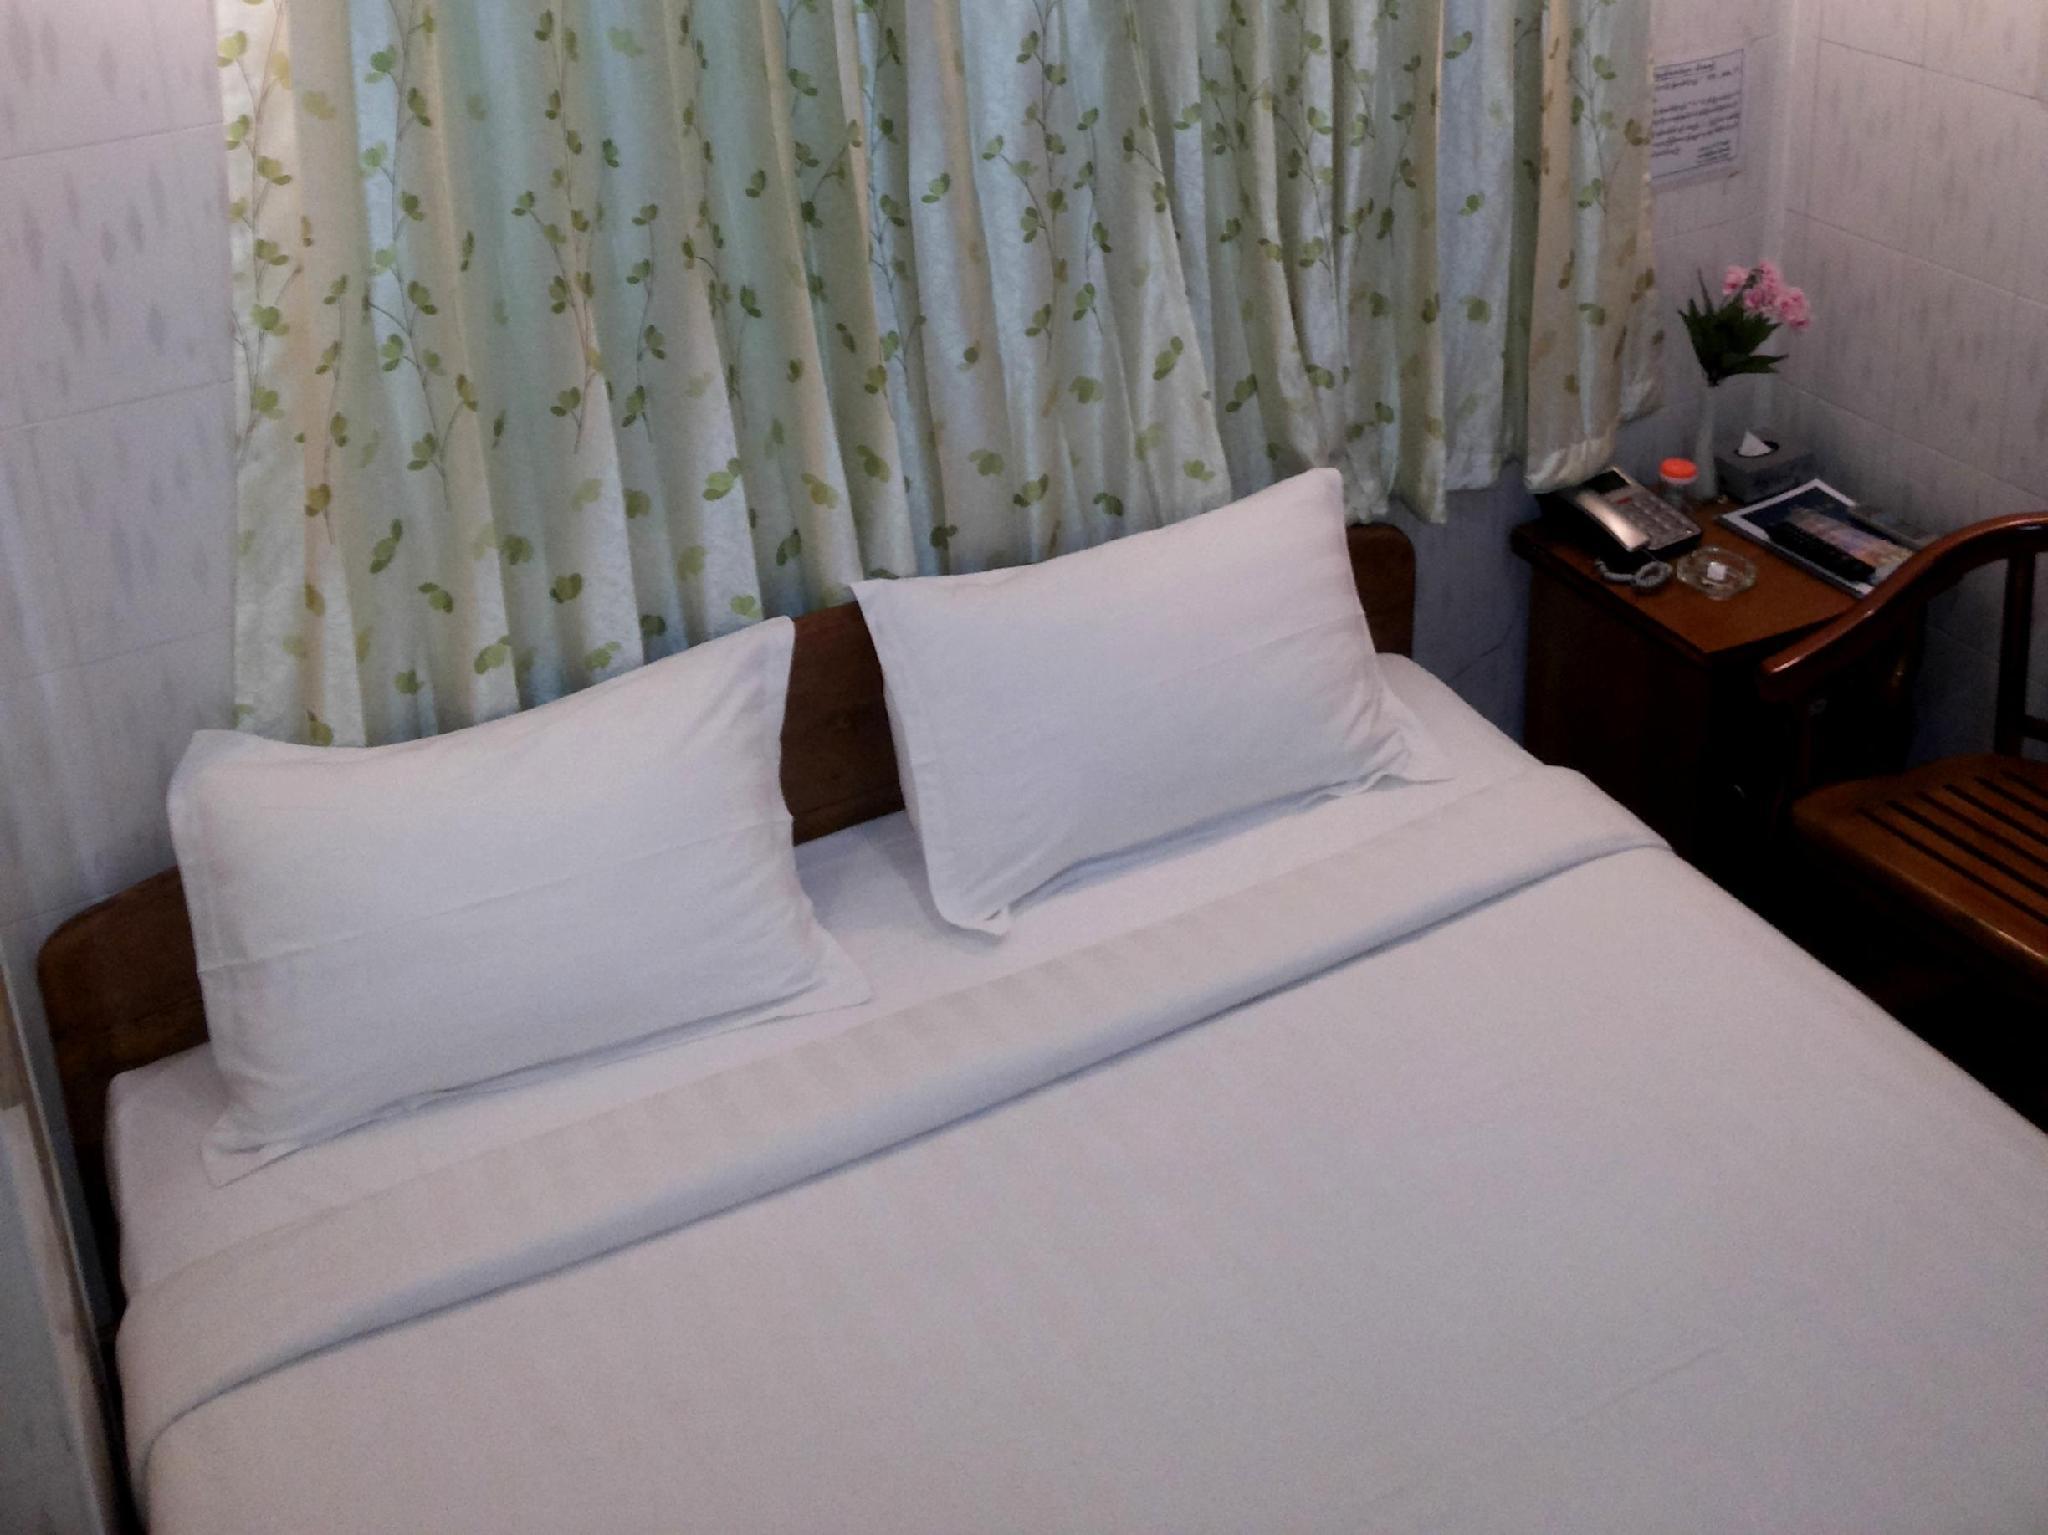 Aung Shun Lai Hotel, Mandalay